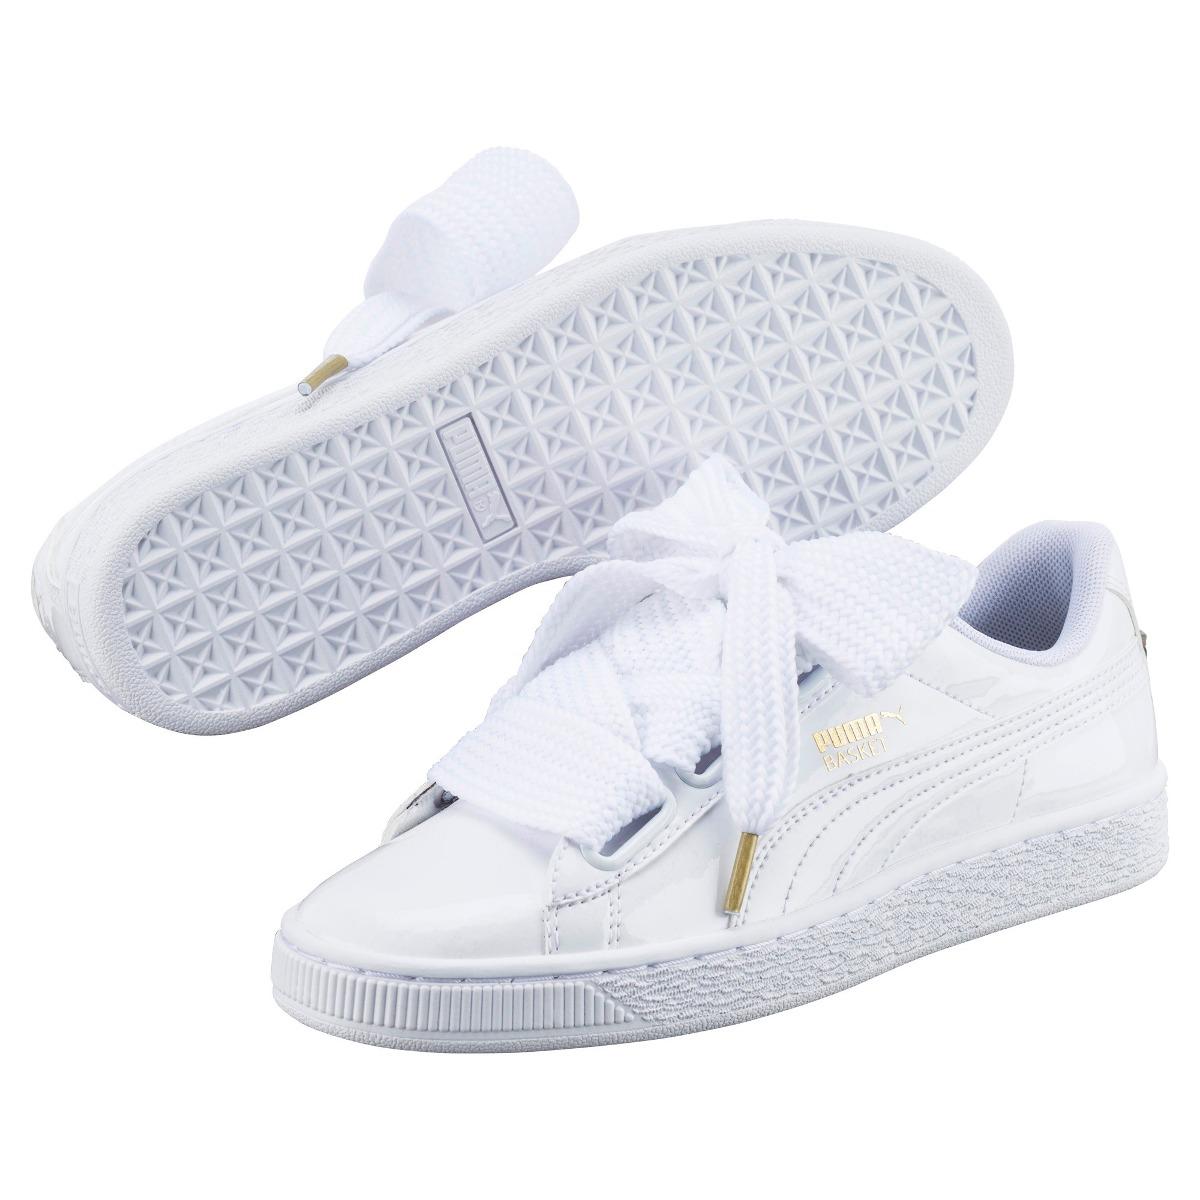 Ultima Basket Puma Zapatillas Coleccion Para Tenis Dama aqPxIq5